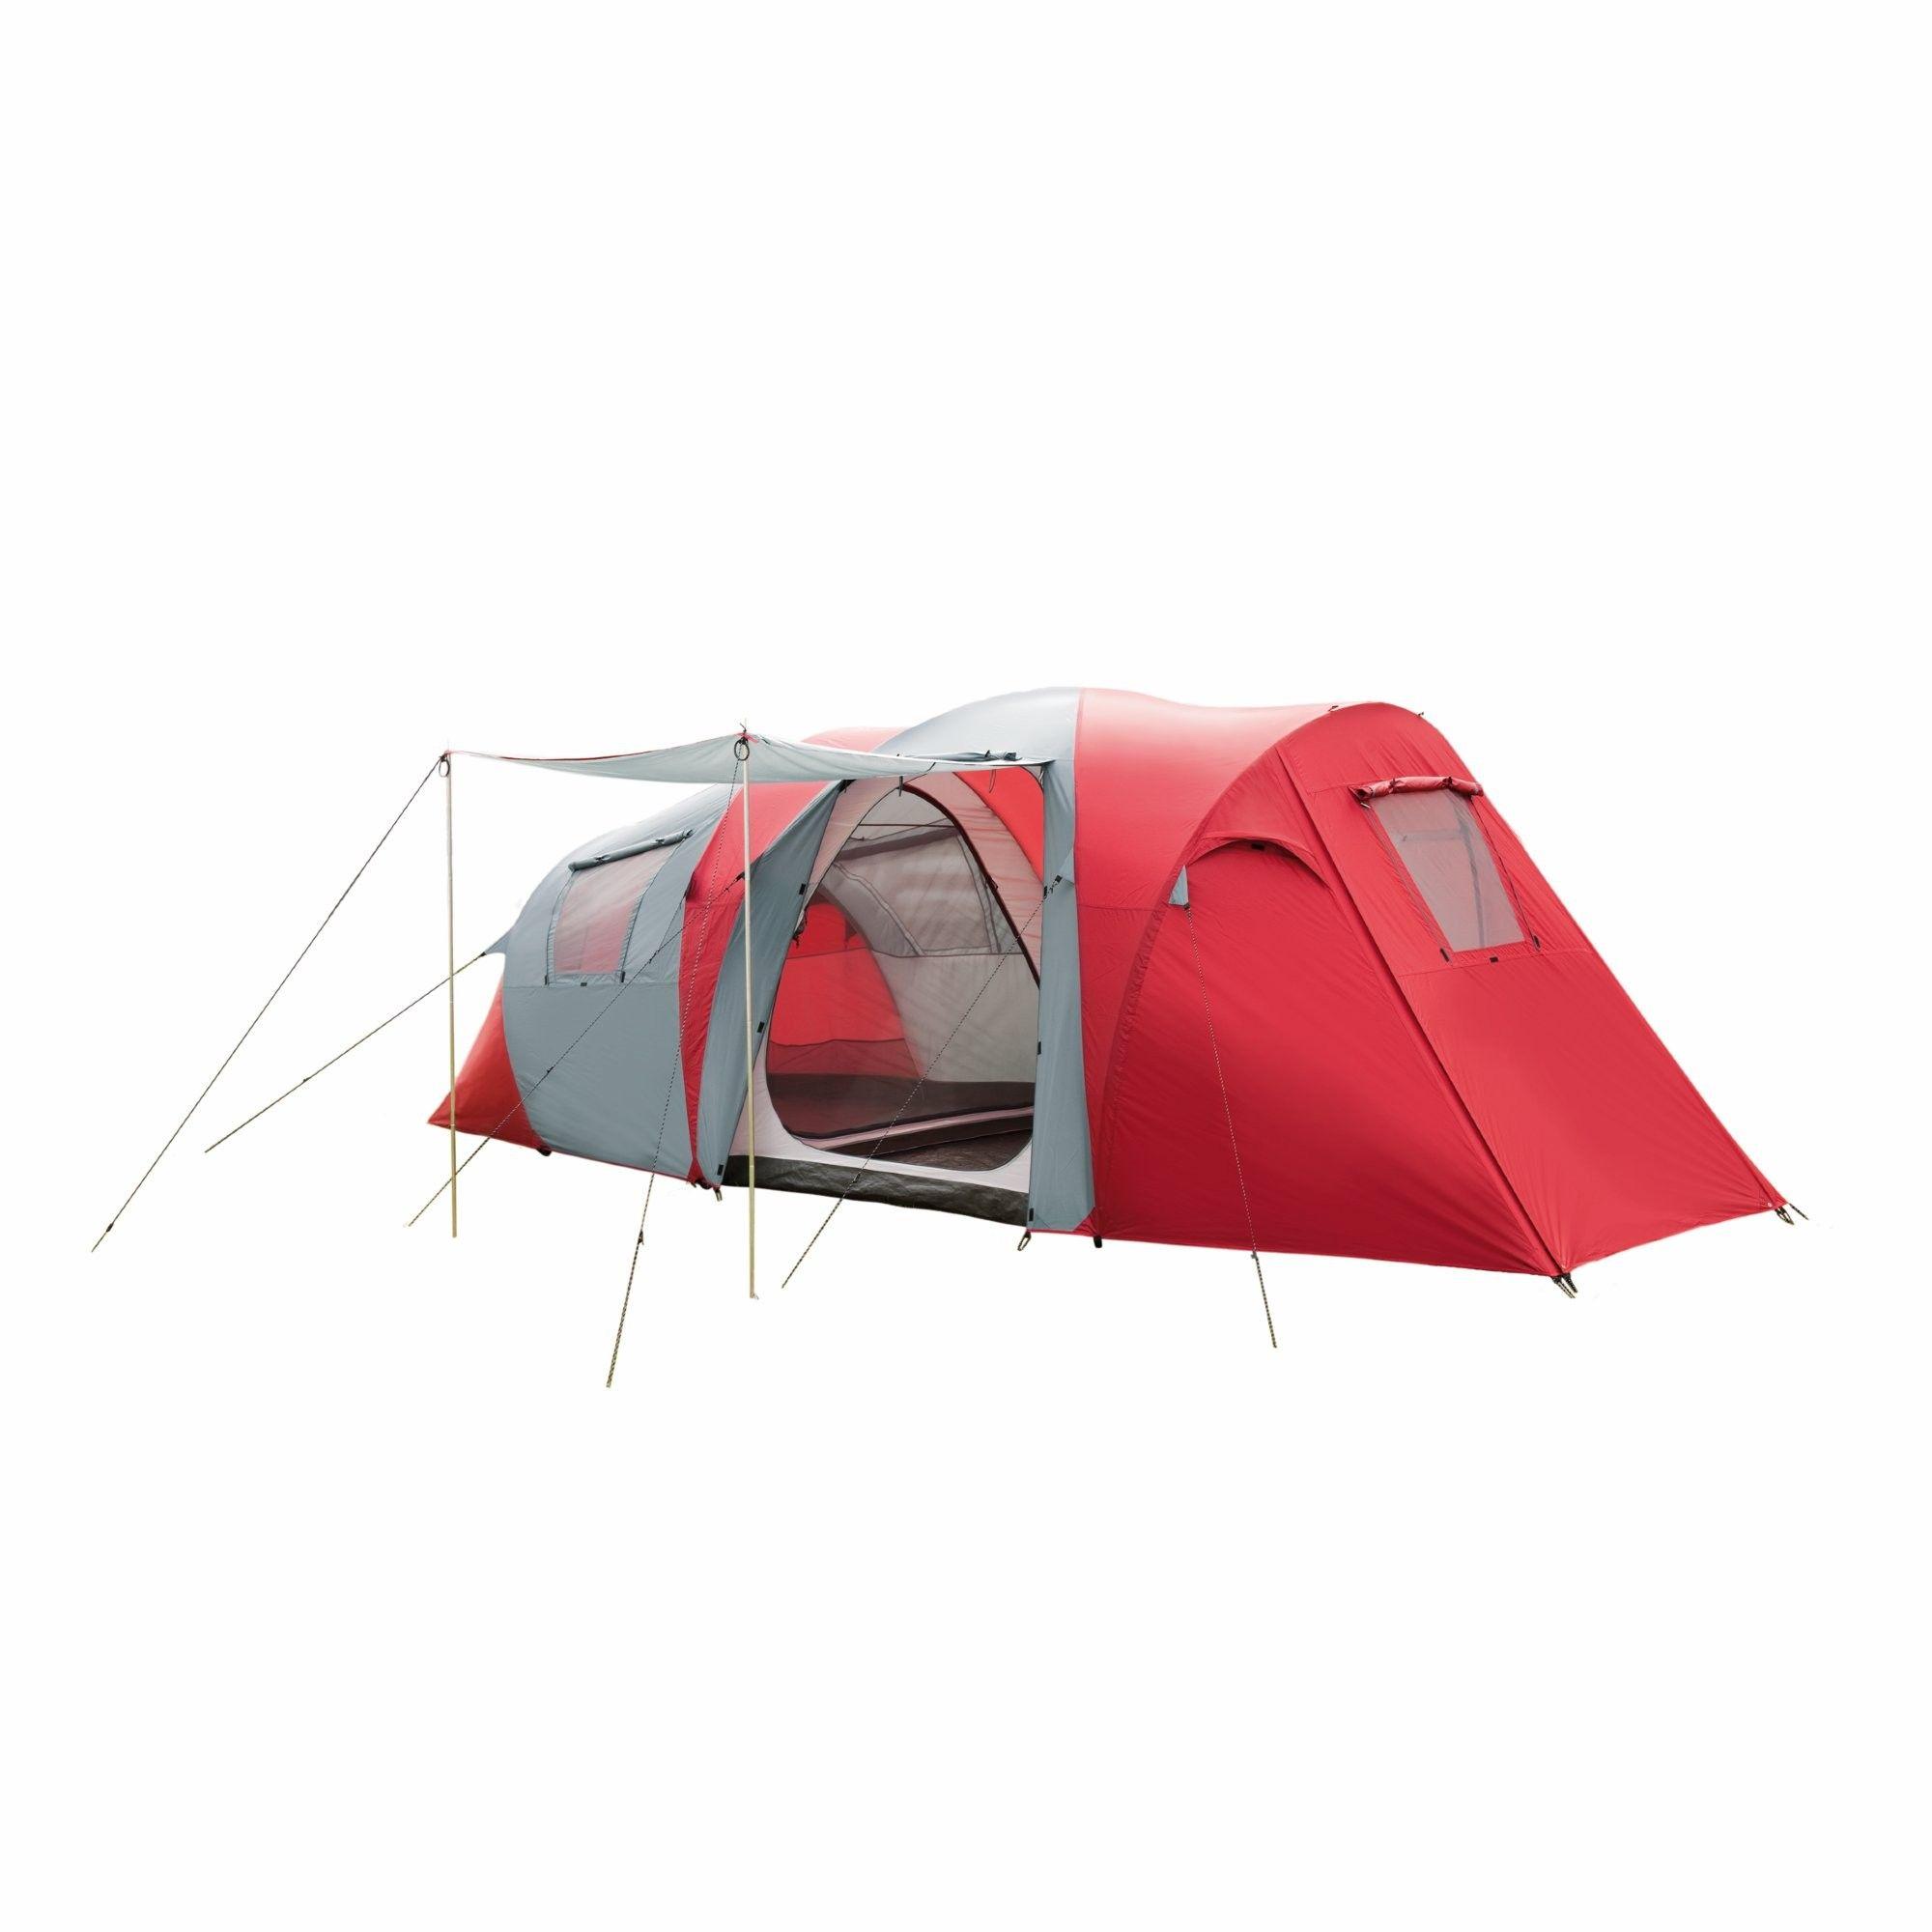 Kathmandu - Retreat 270 4-person tent  sc 1 st  Pinterest & Kathmandu - Retreat 270 4-person tent | Camping | Pinterest | Tents